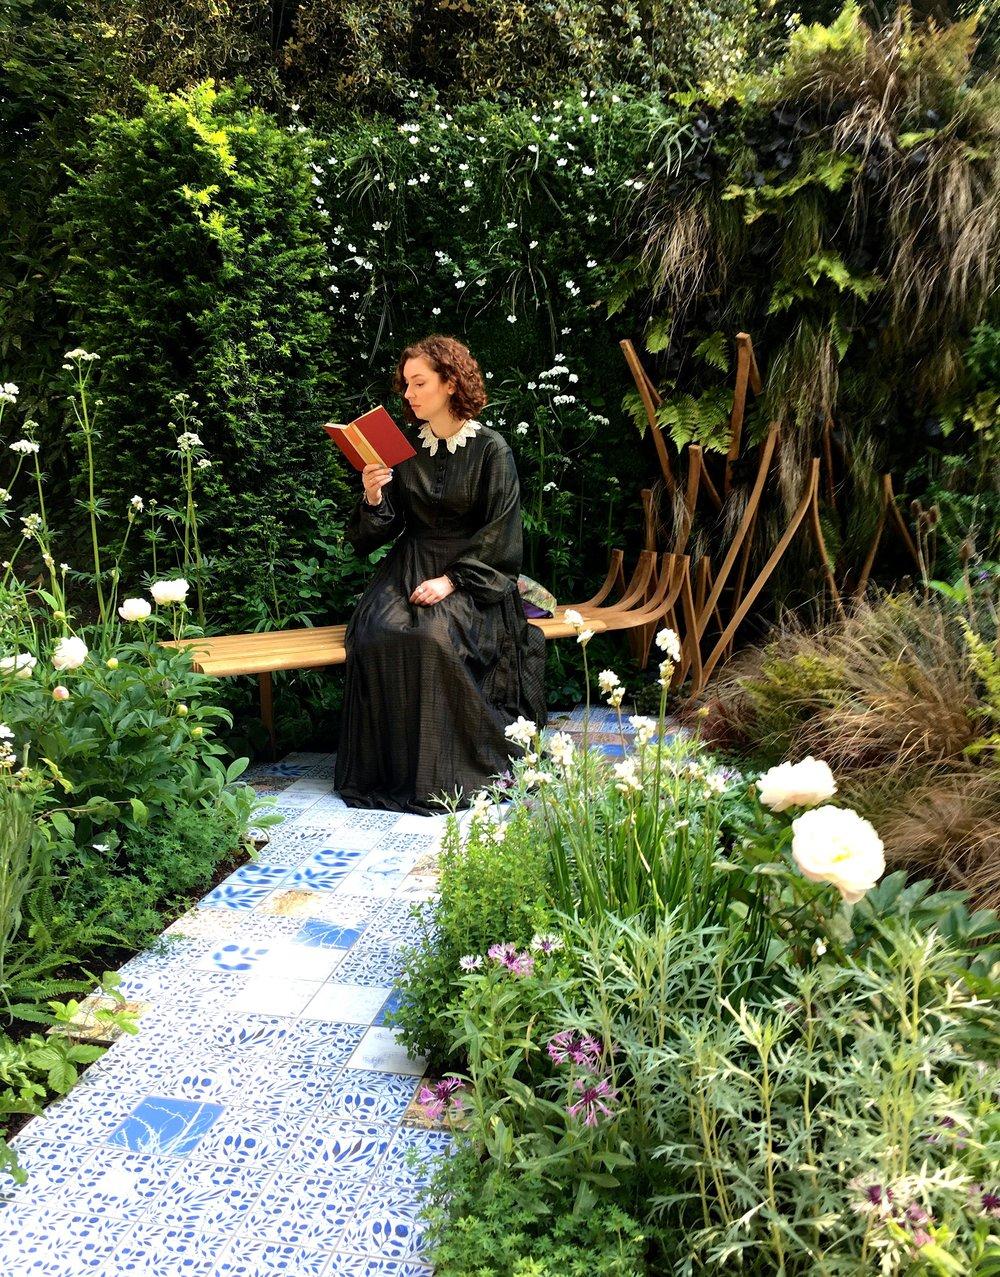 Leslie Forbes' novel Embroidered Minds of the Morris Women